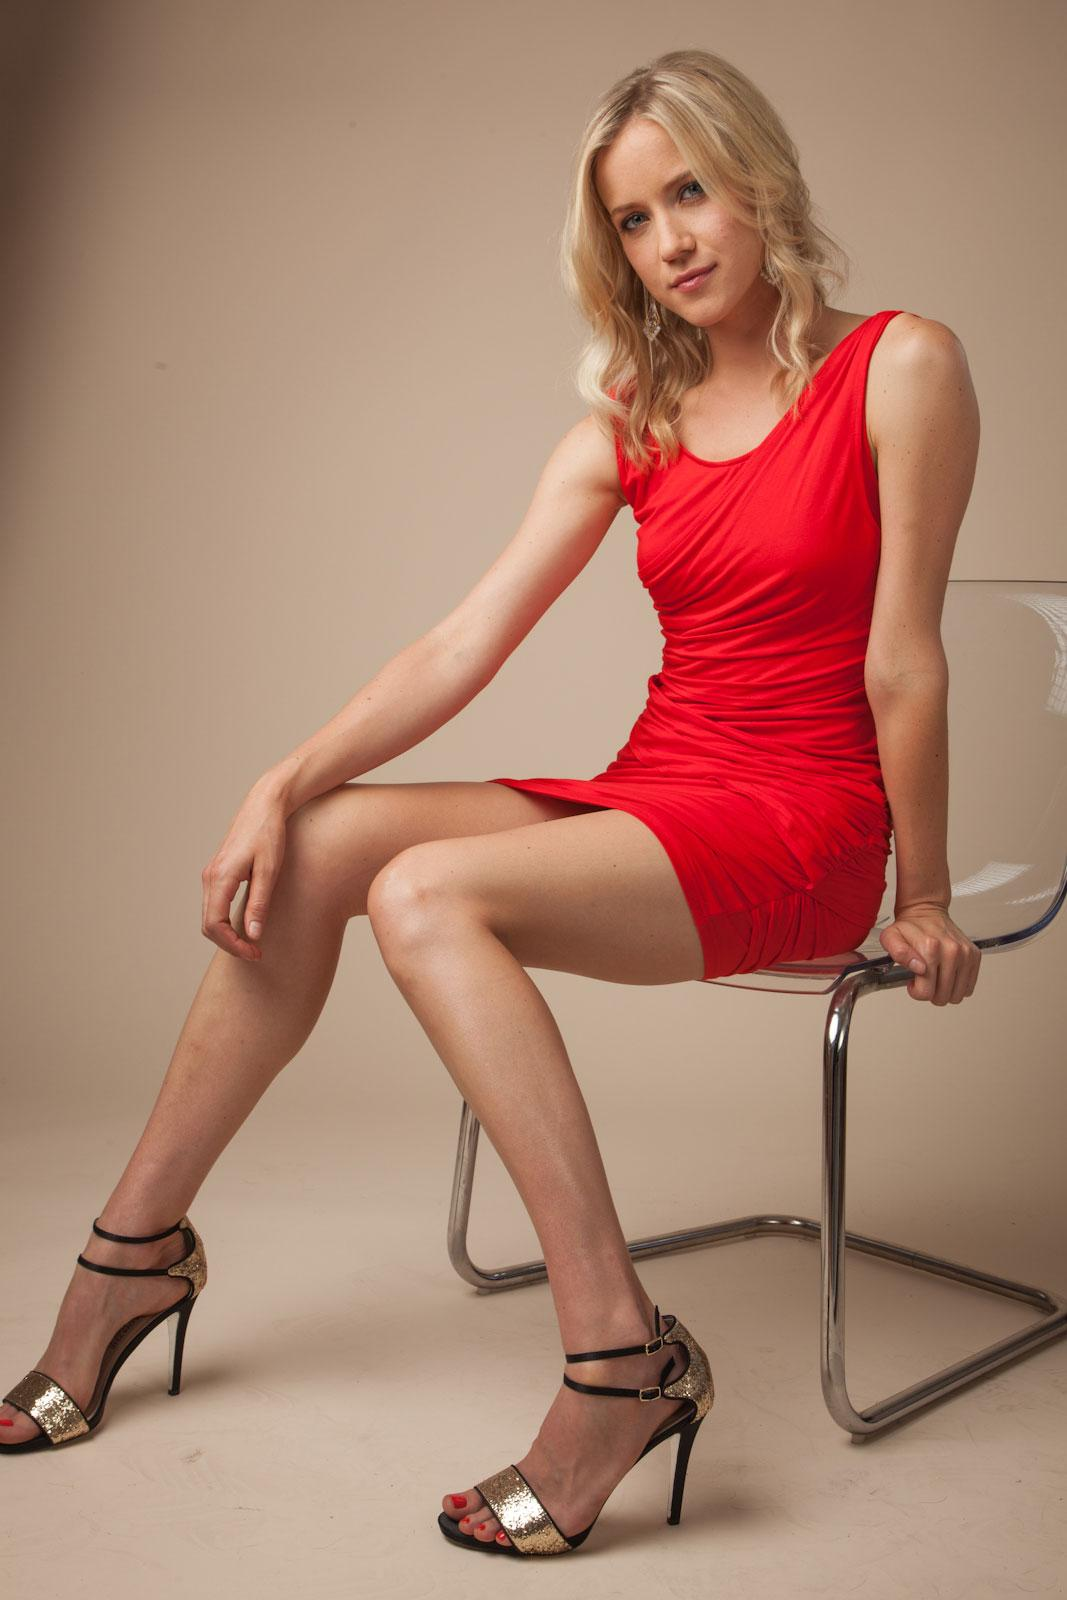 Jessy Schram en mini-robe